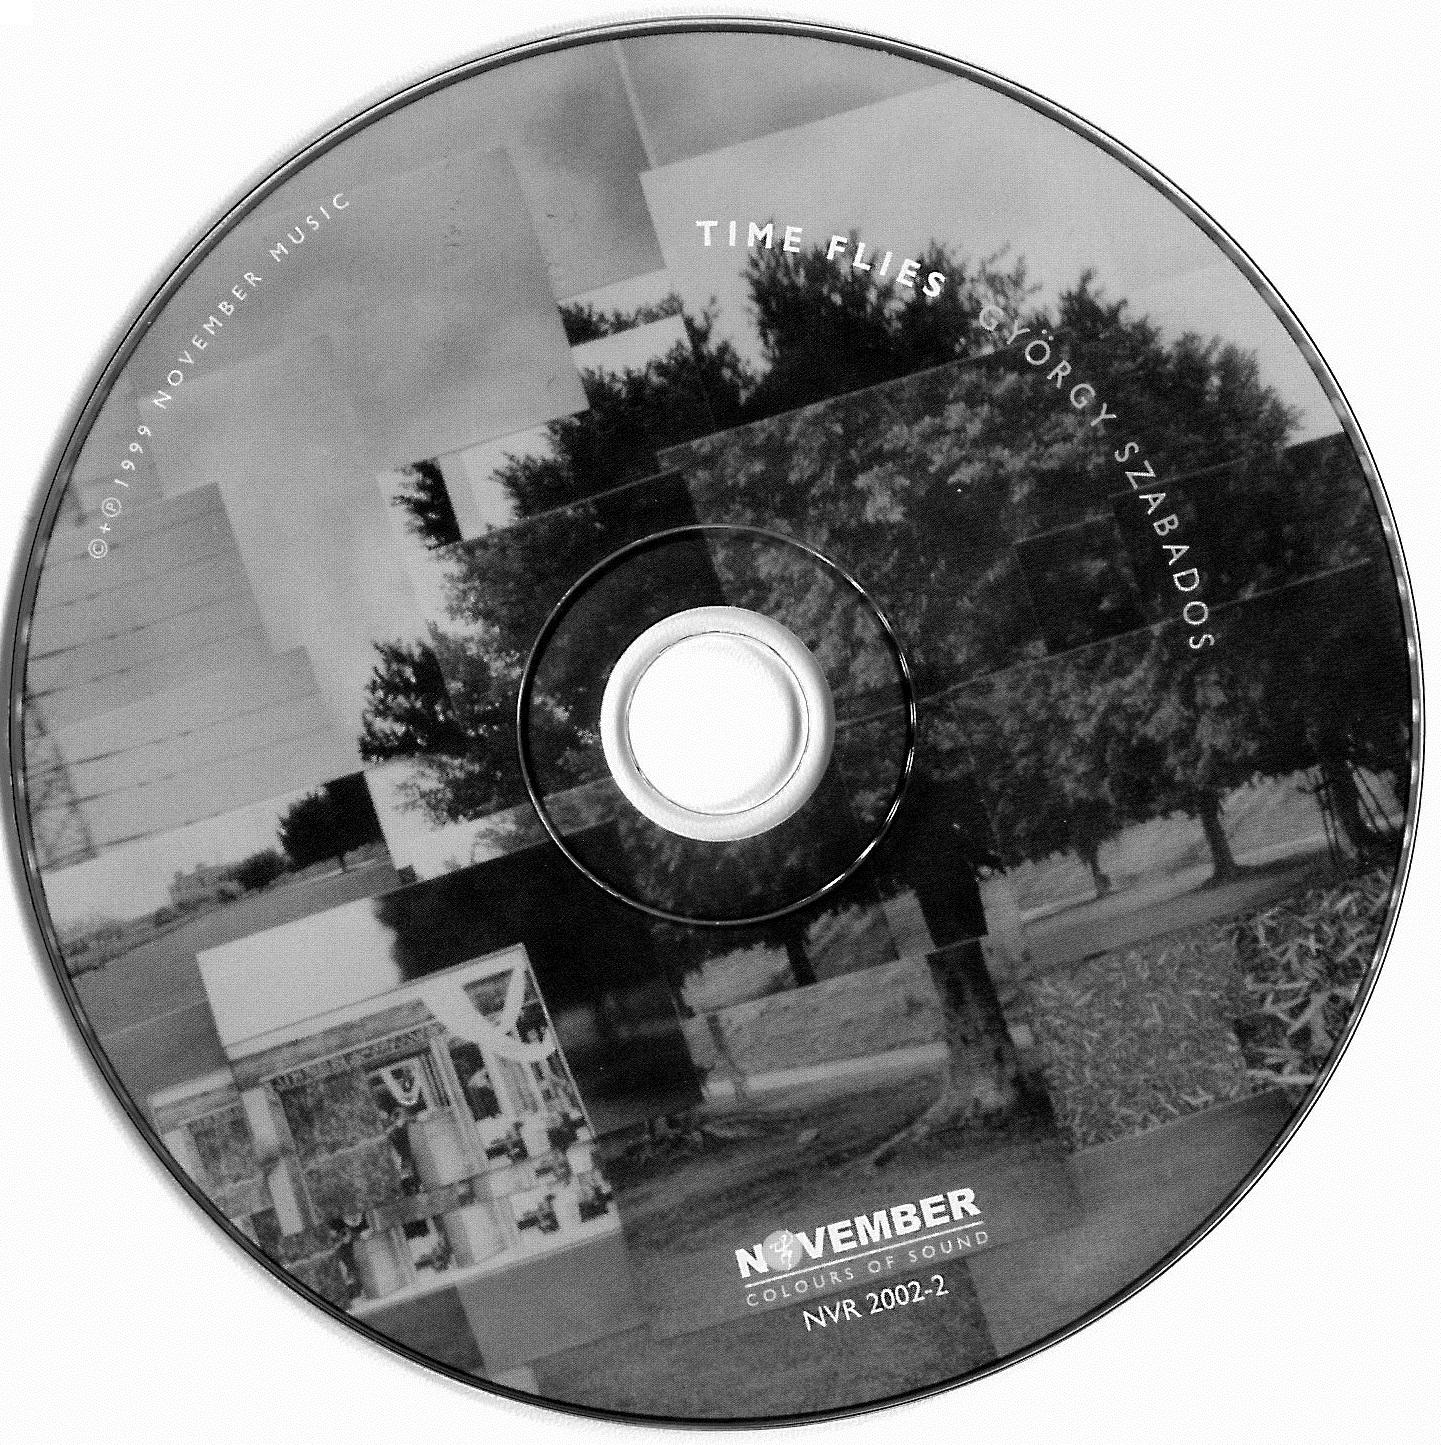 GSDA2001CD